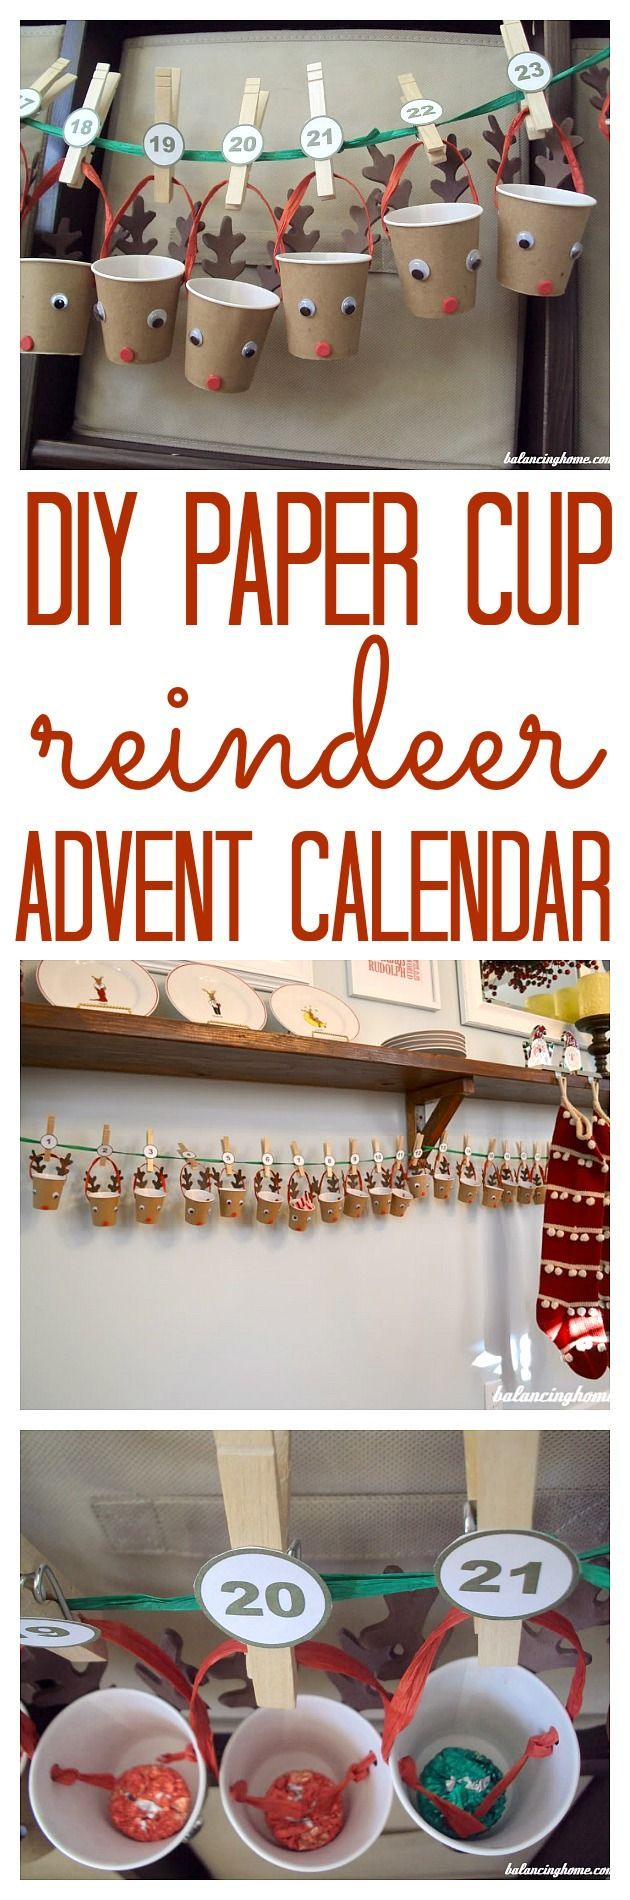 Fun Christmas craft and decor idea. DIY paper cup reindeer advent calendar.